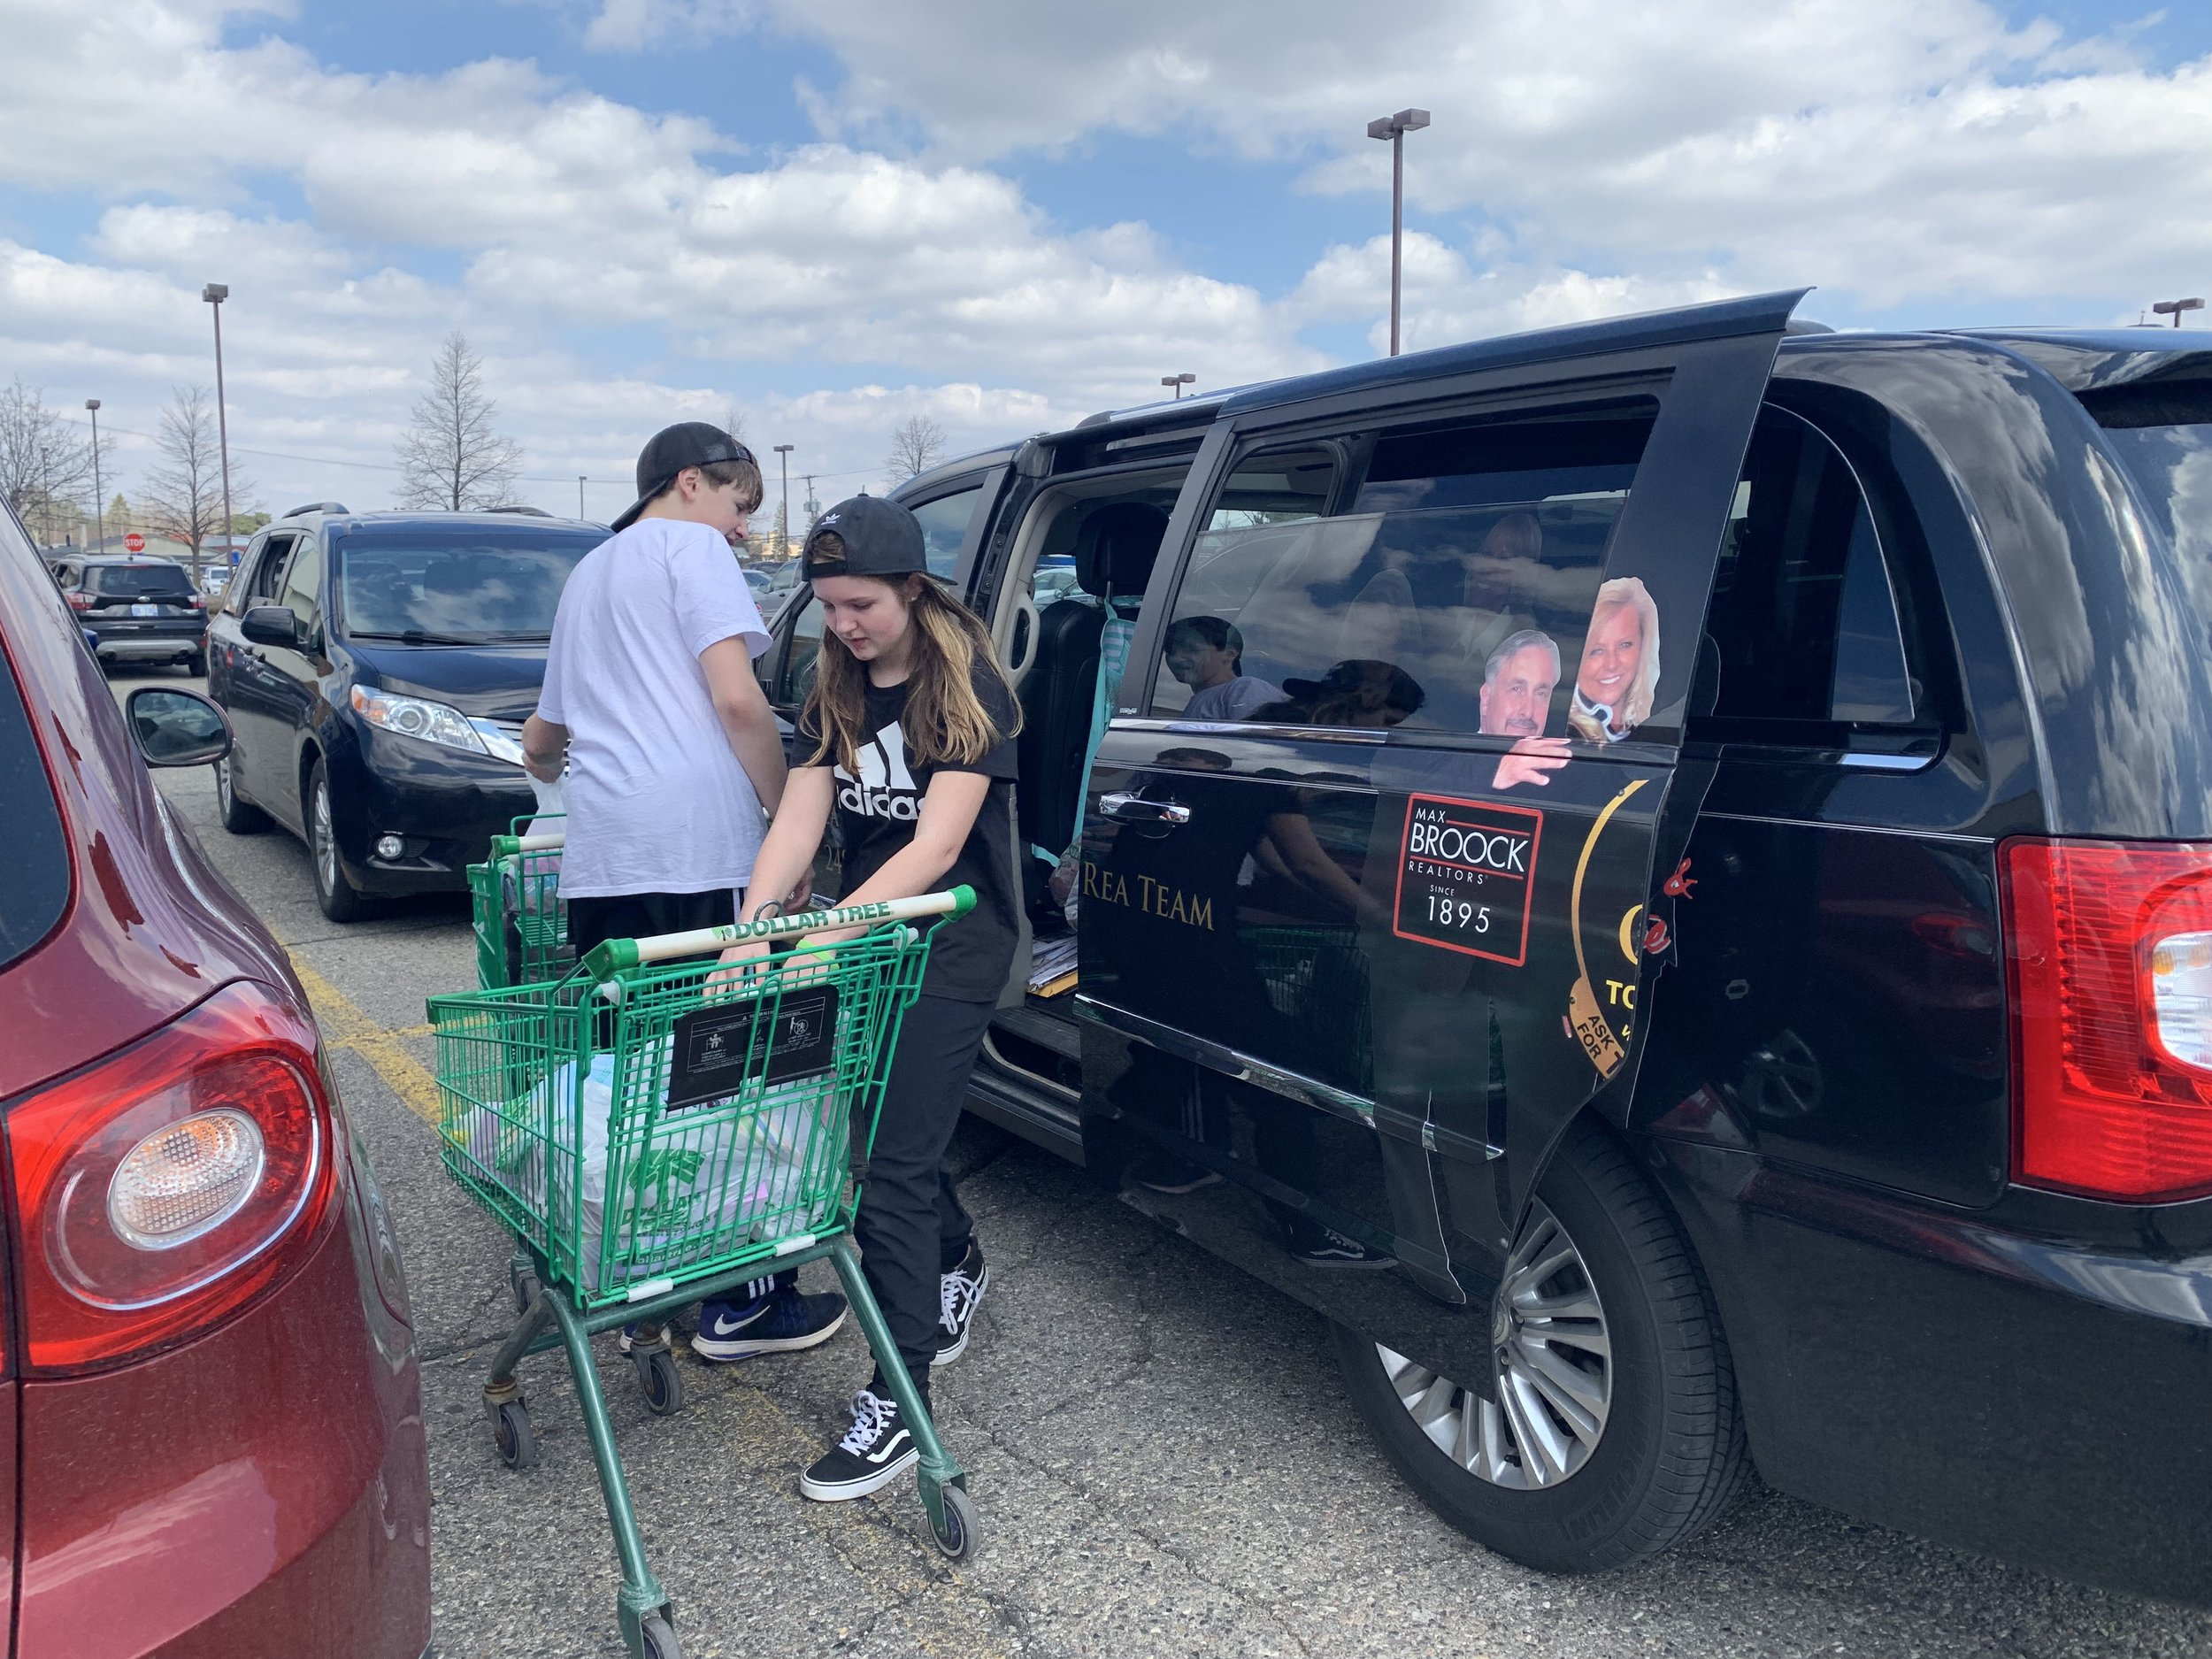 Loading up the Linda Rea Team van with Easter basket finds for the children.